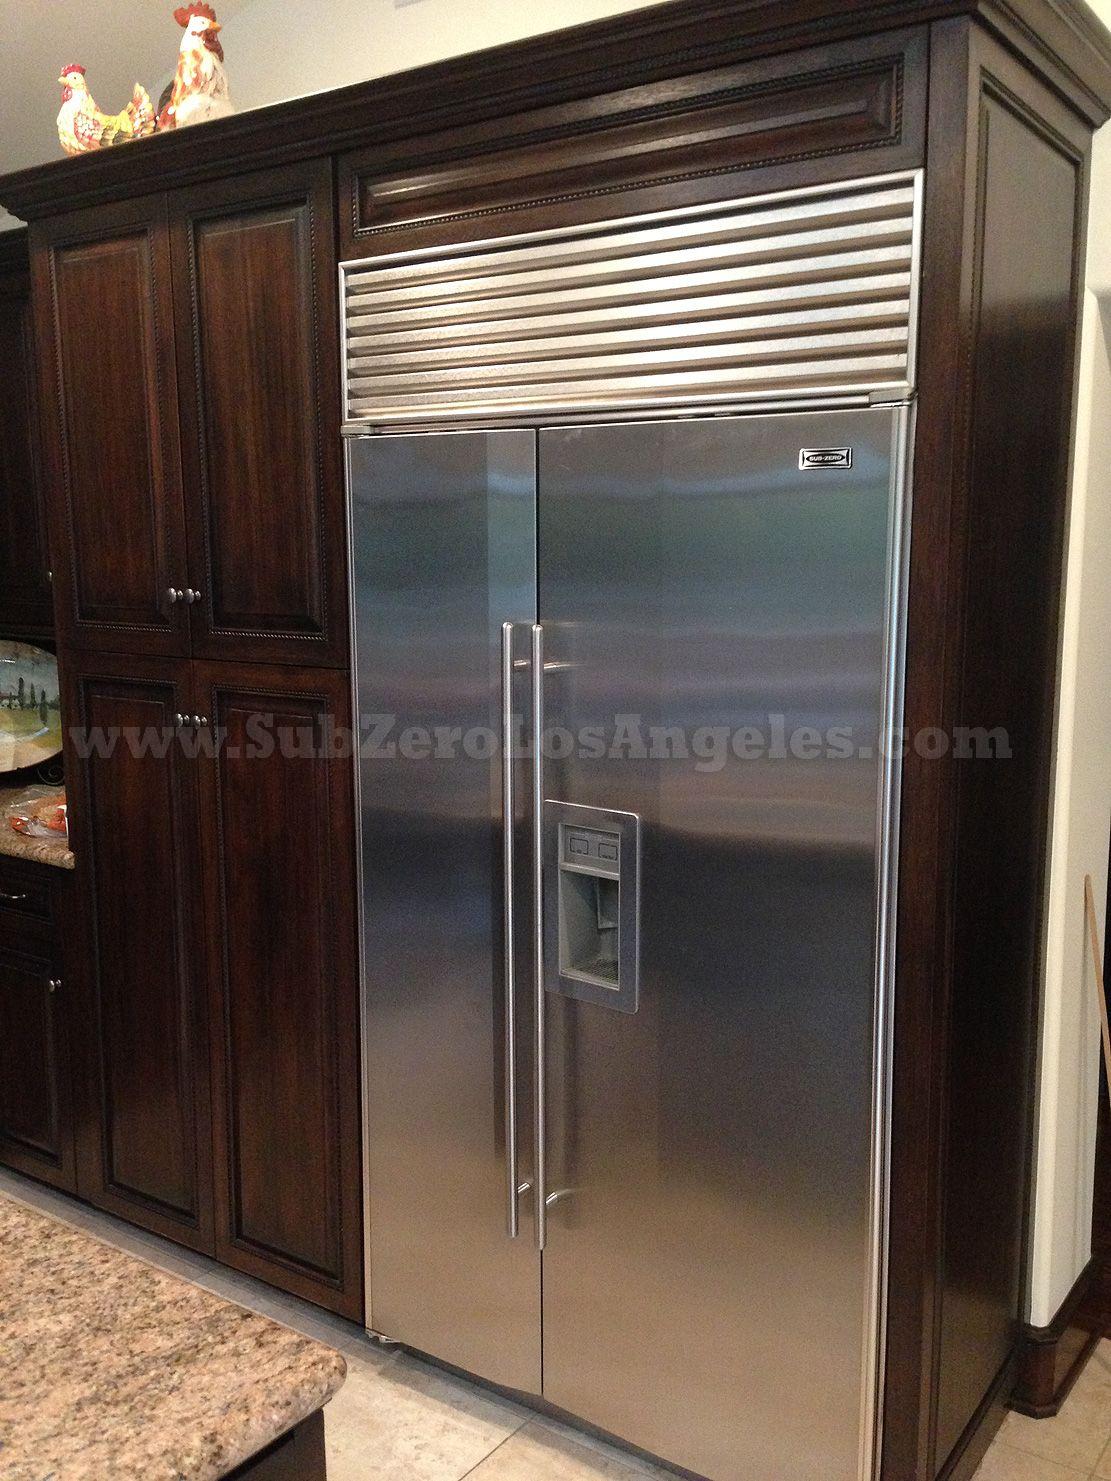 Sub Zero Refrigerator Pricing Sub Zero Refrigerator Problems Sub Zero Refrigerator Reliability